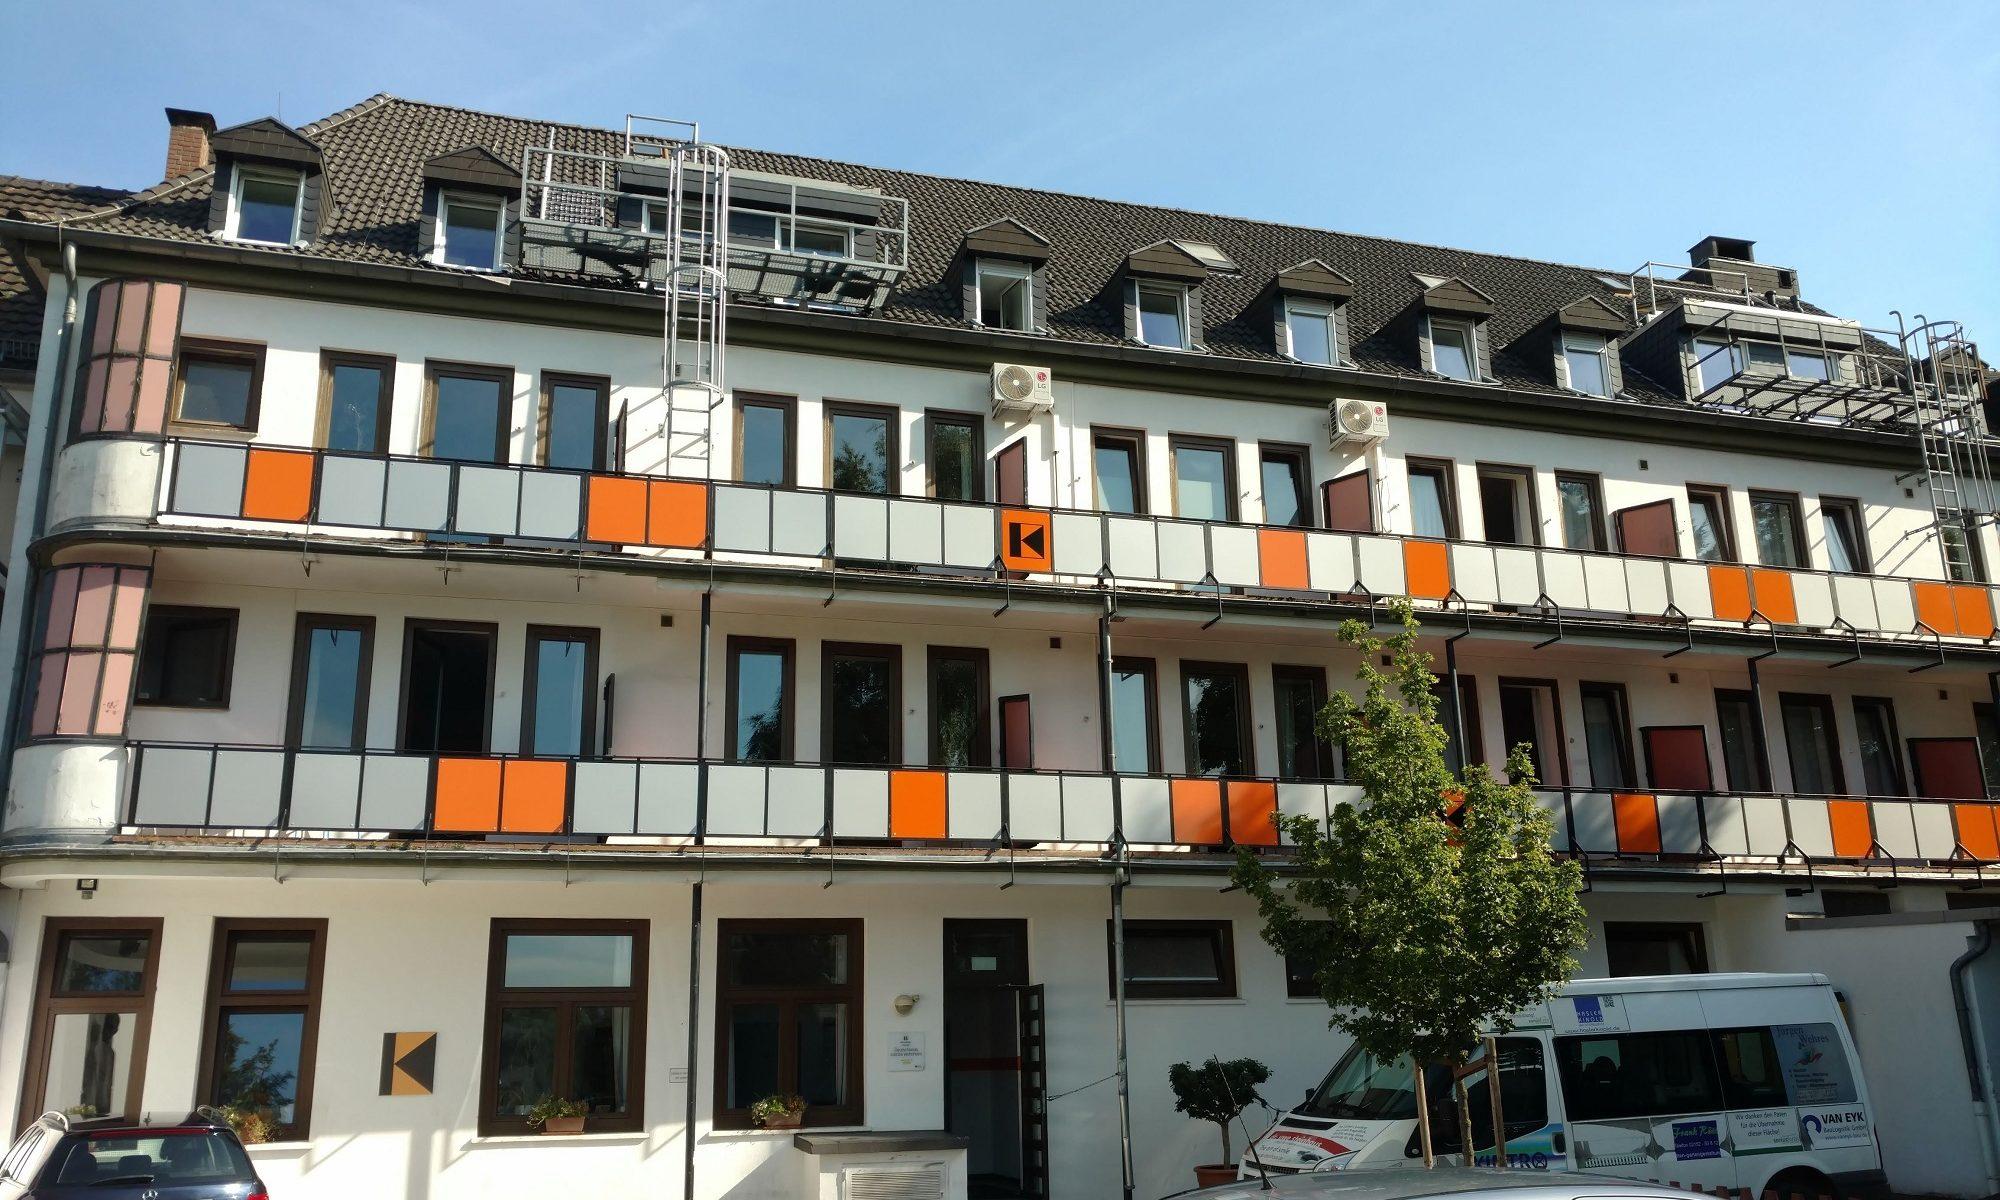 Kolpinghaus Krefeld